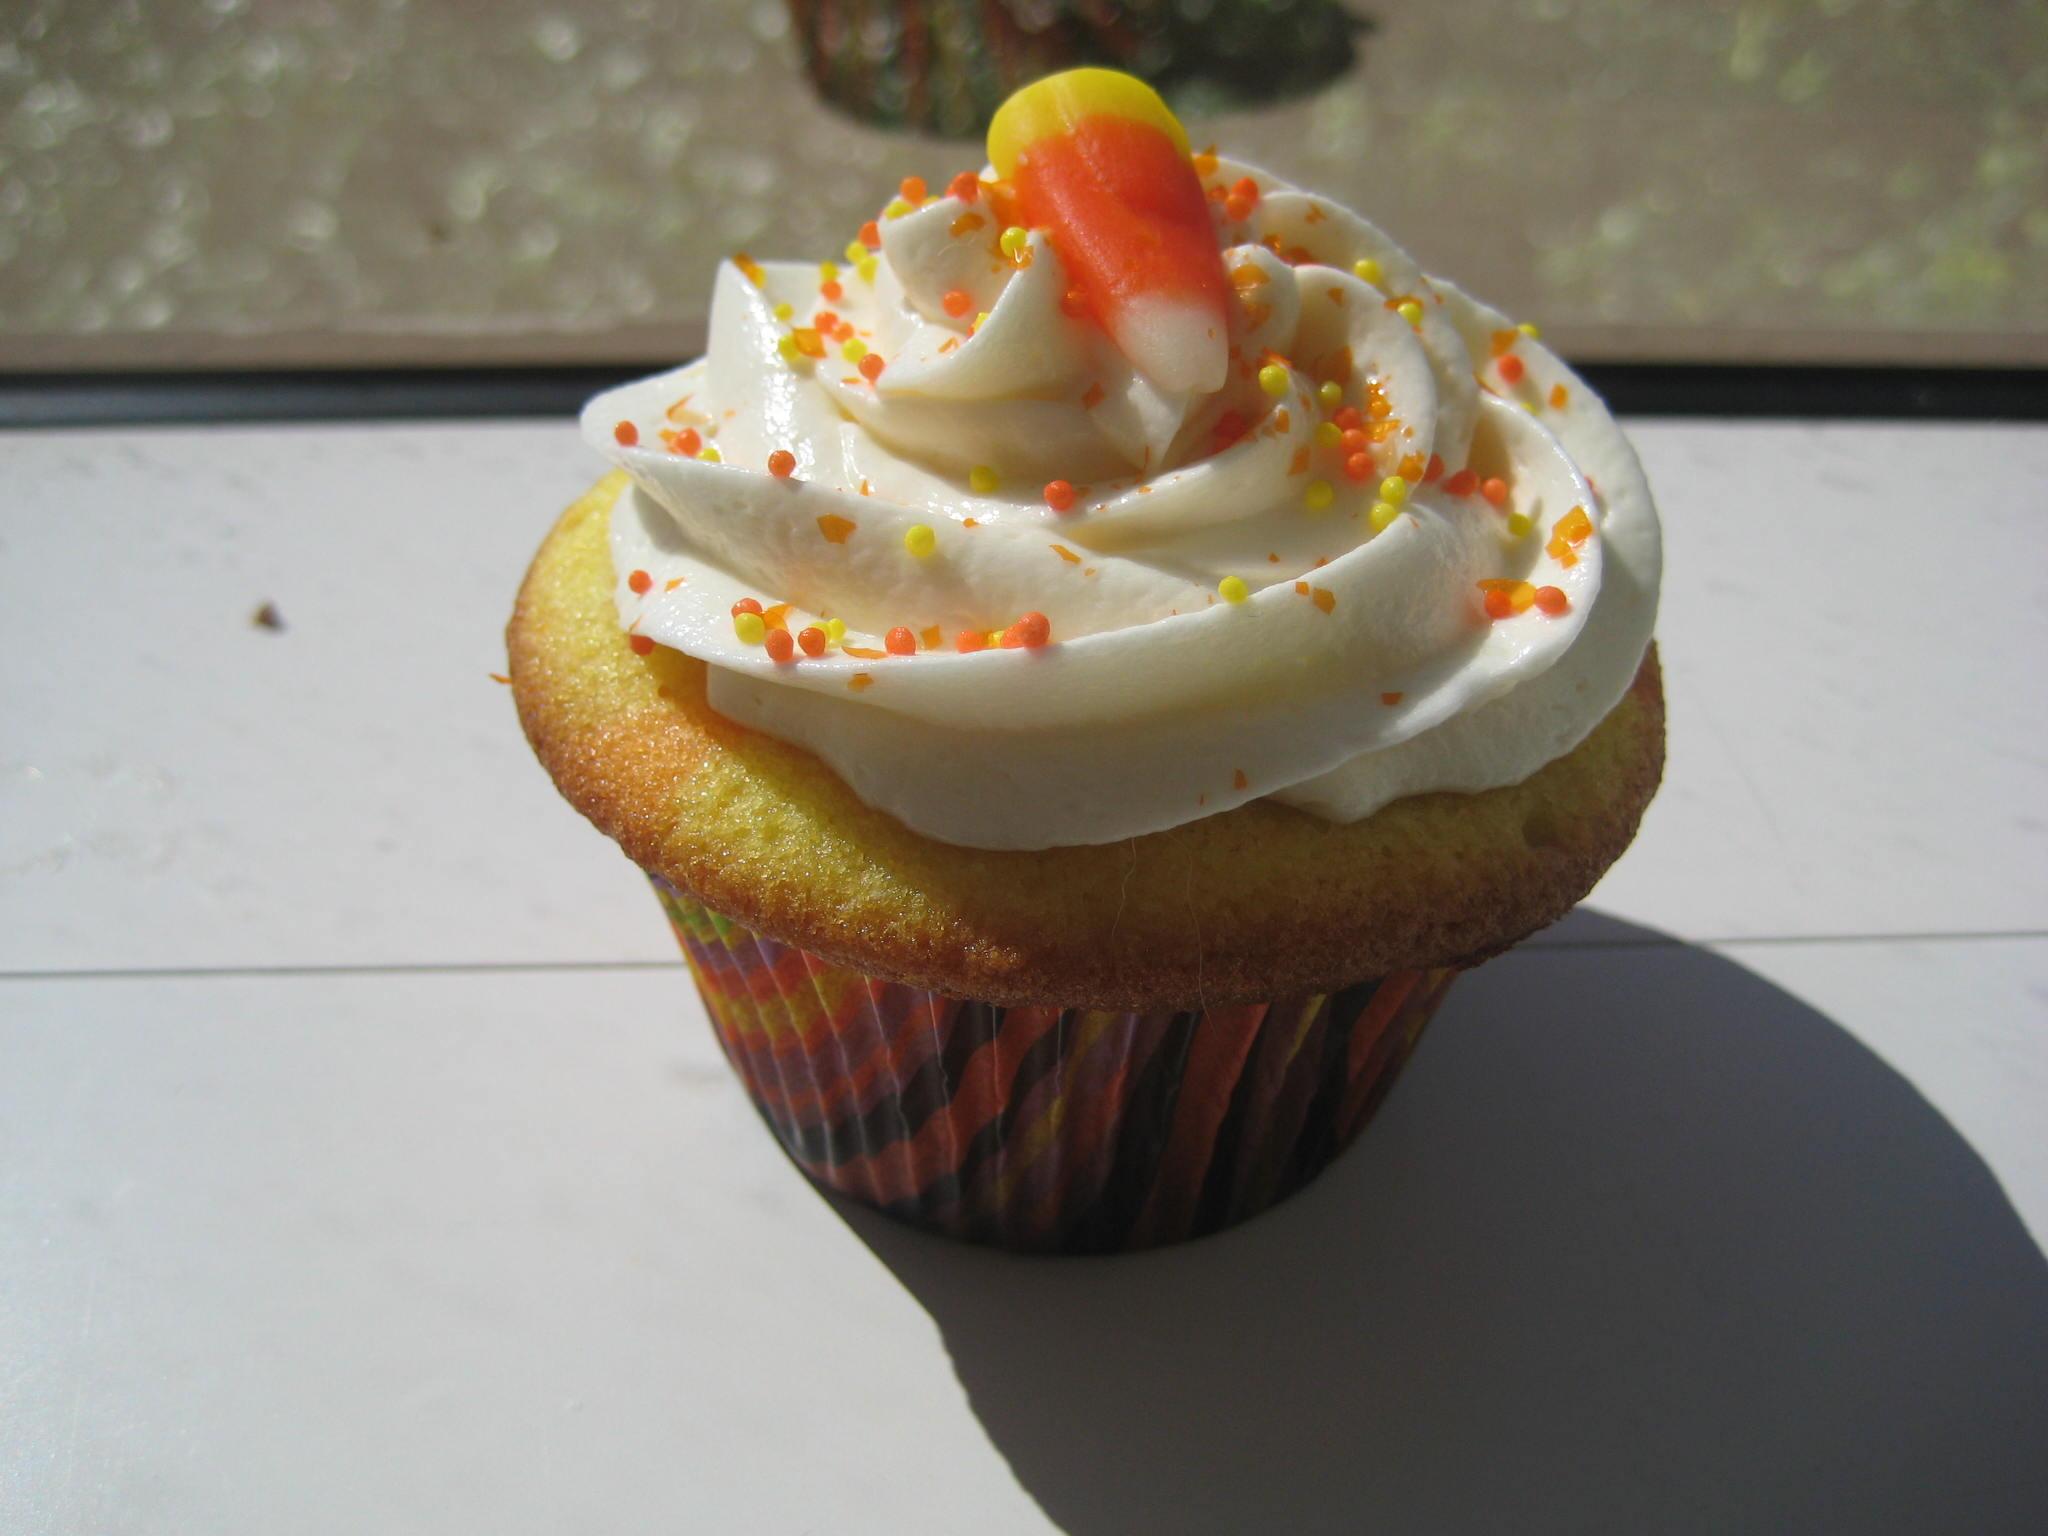 File:Candy Corn Cupcake.jpg